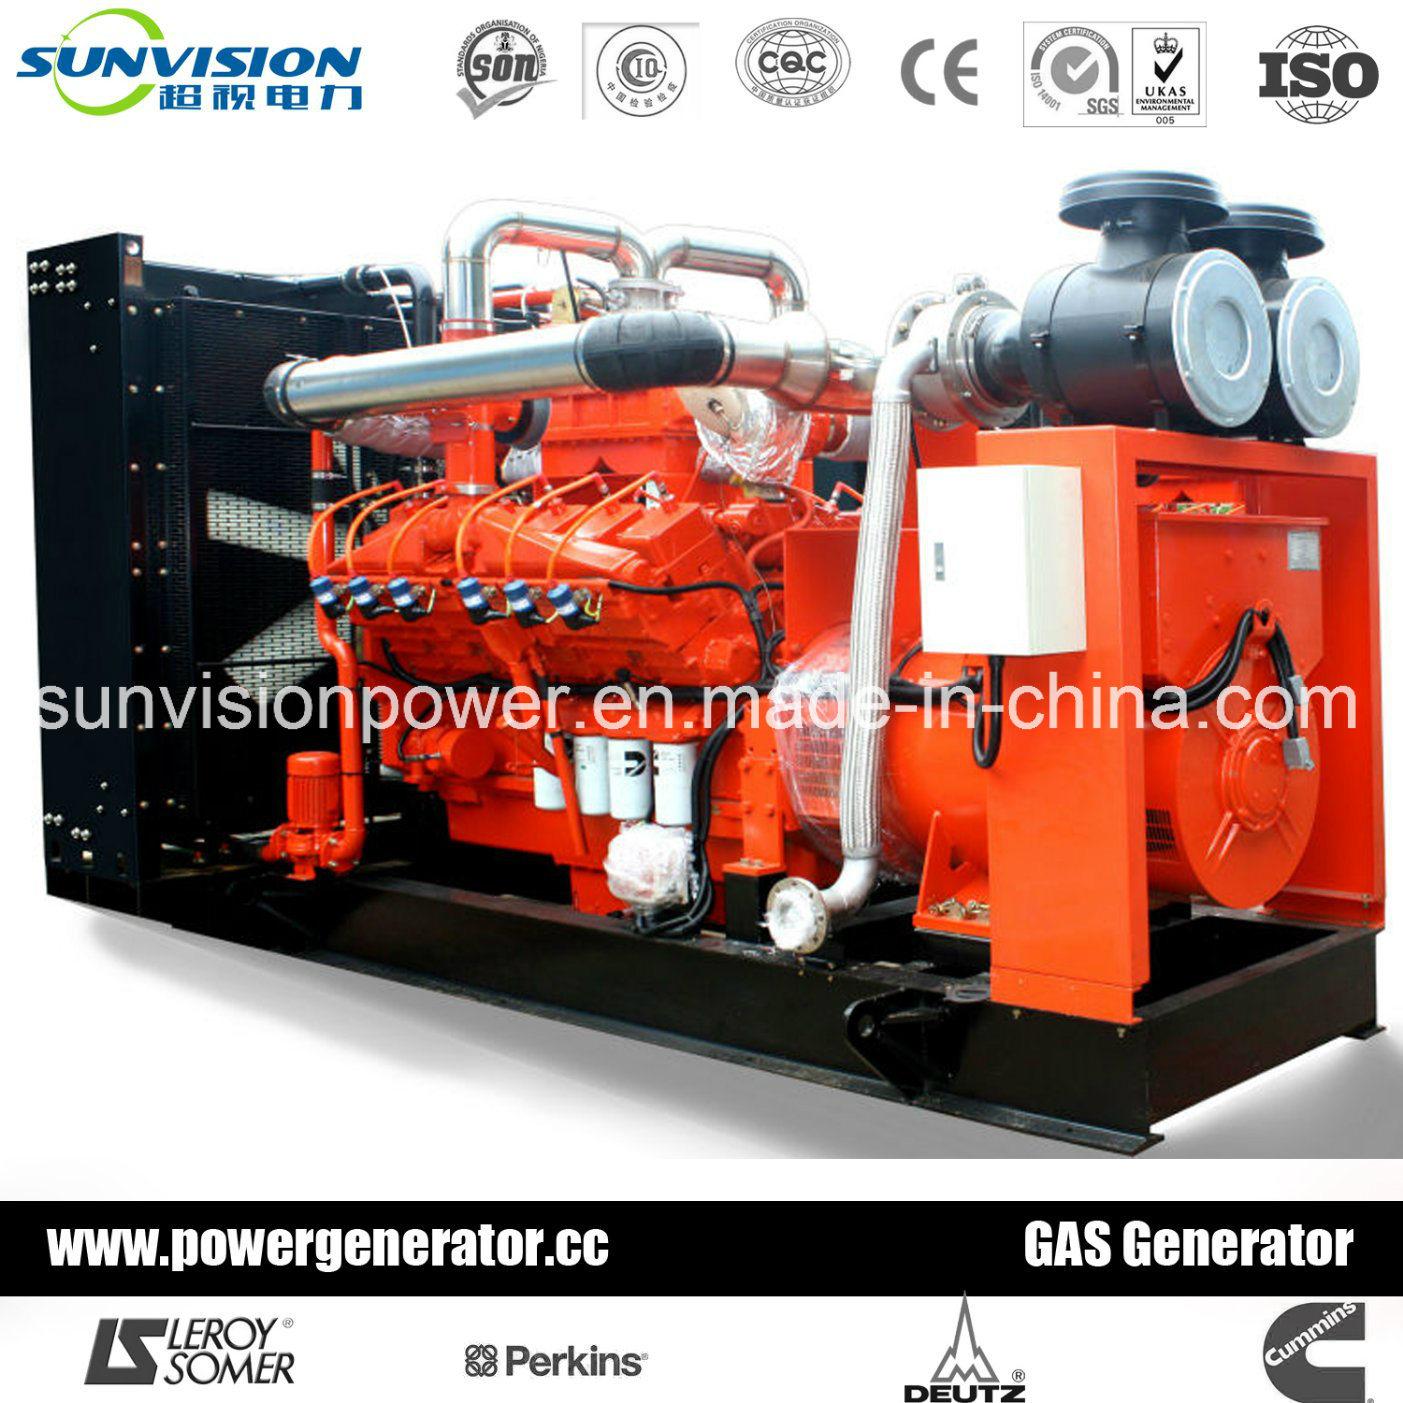 1375kVA Industrial Gas Genset with Cummins Engine